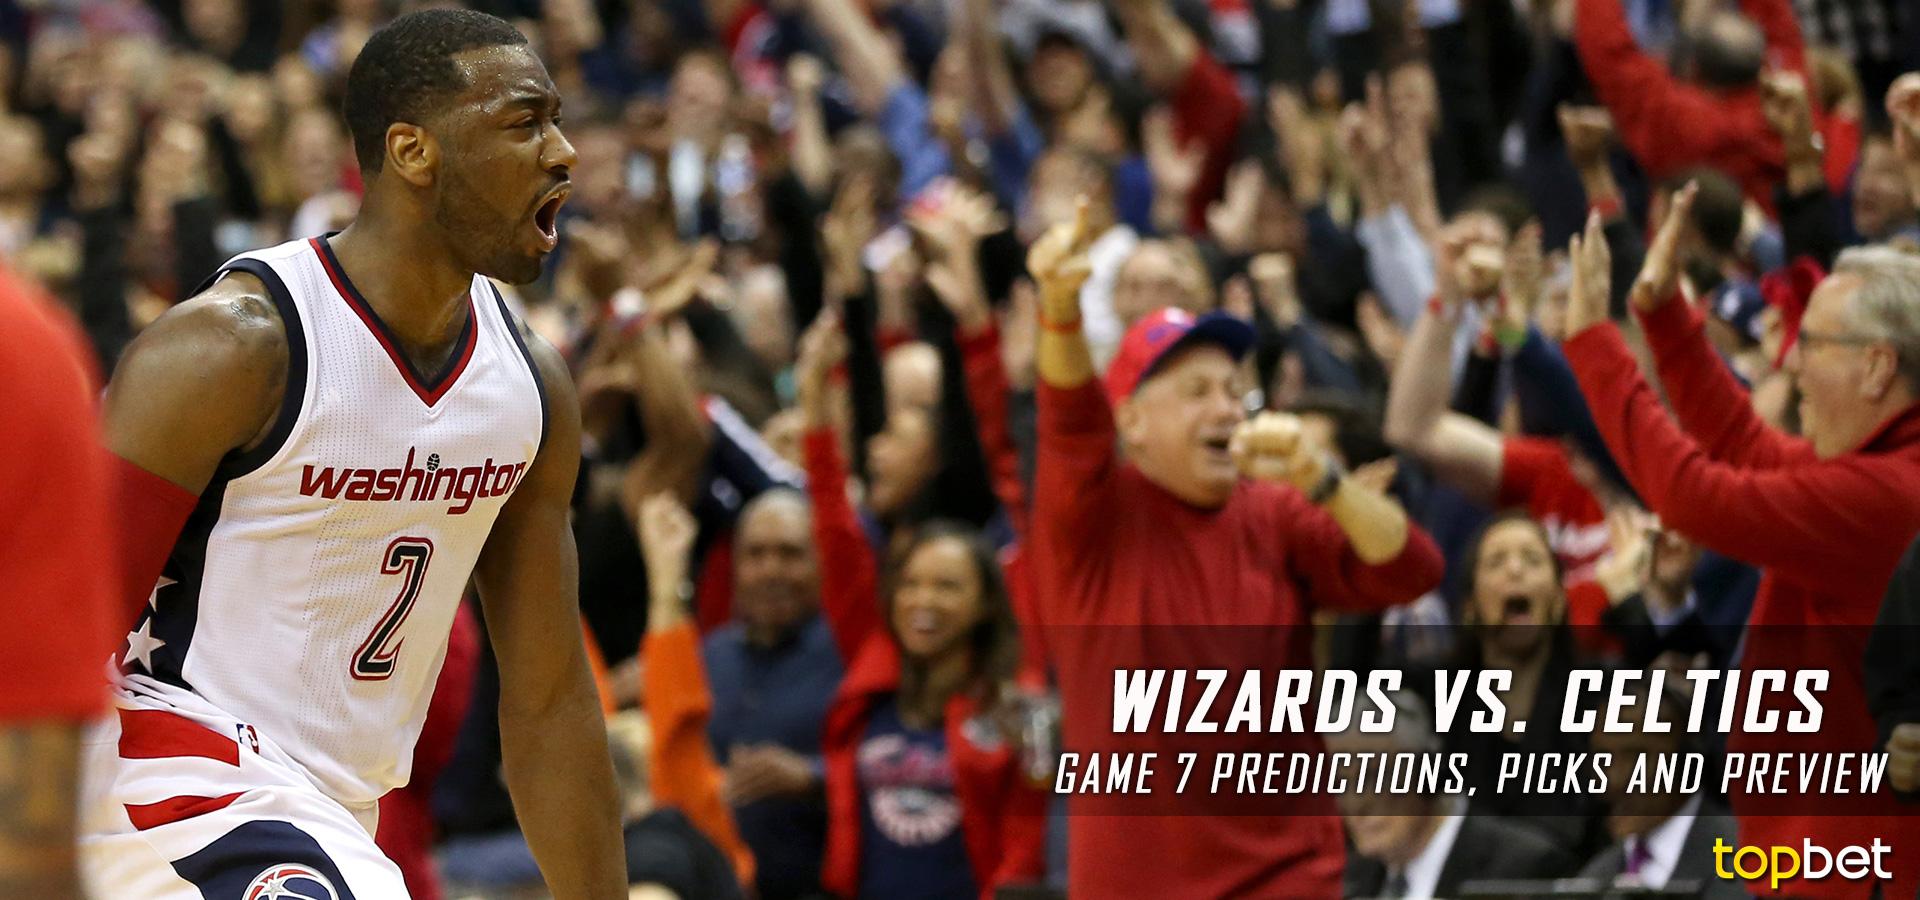 Cavaliers vs warriors game 7 predictions - Cavaliers Vs Warriors Game 7 Predictions 42